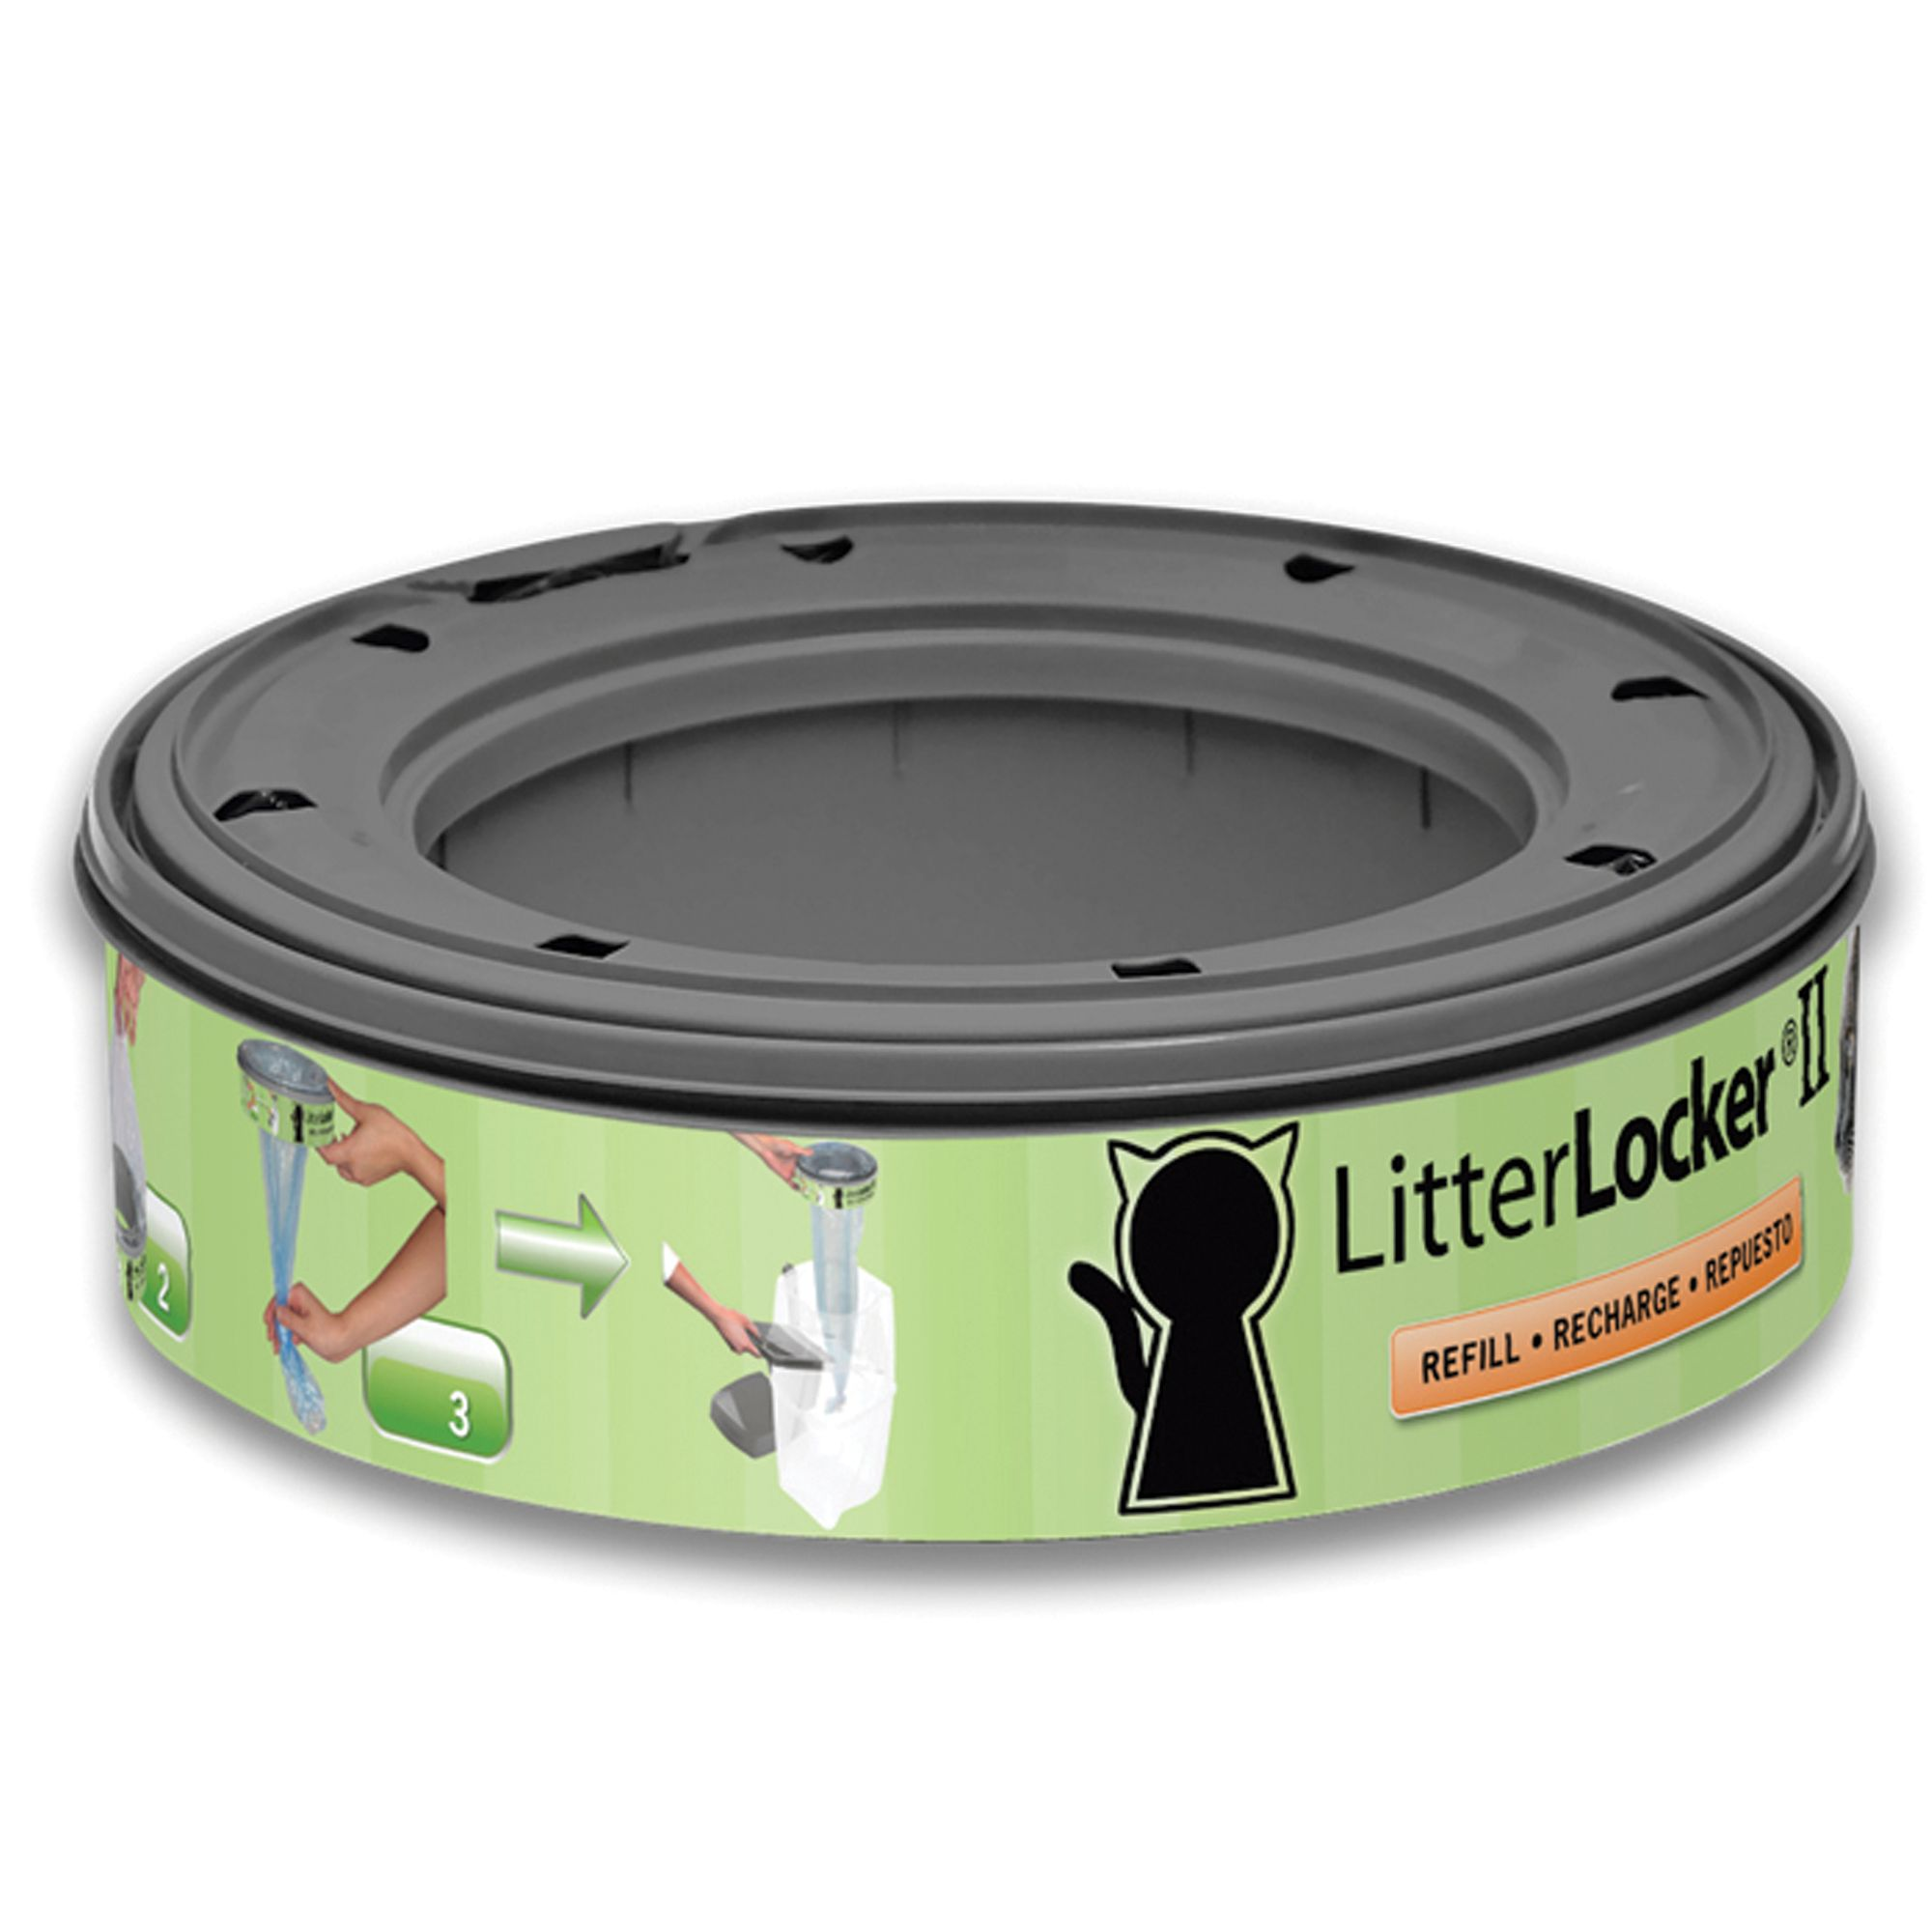 Litterlocker Ii Cat Litter Disposal System Refill Size 1 Count Litter Genie